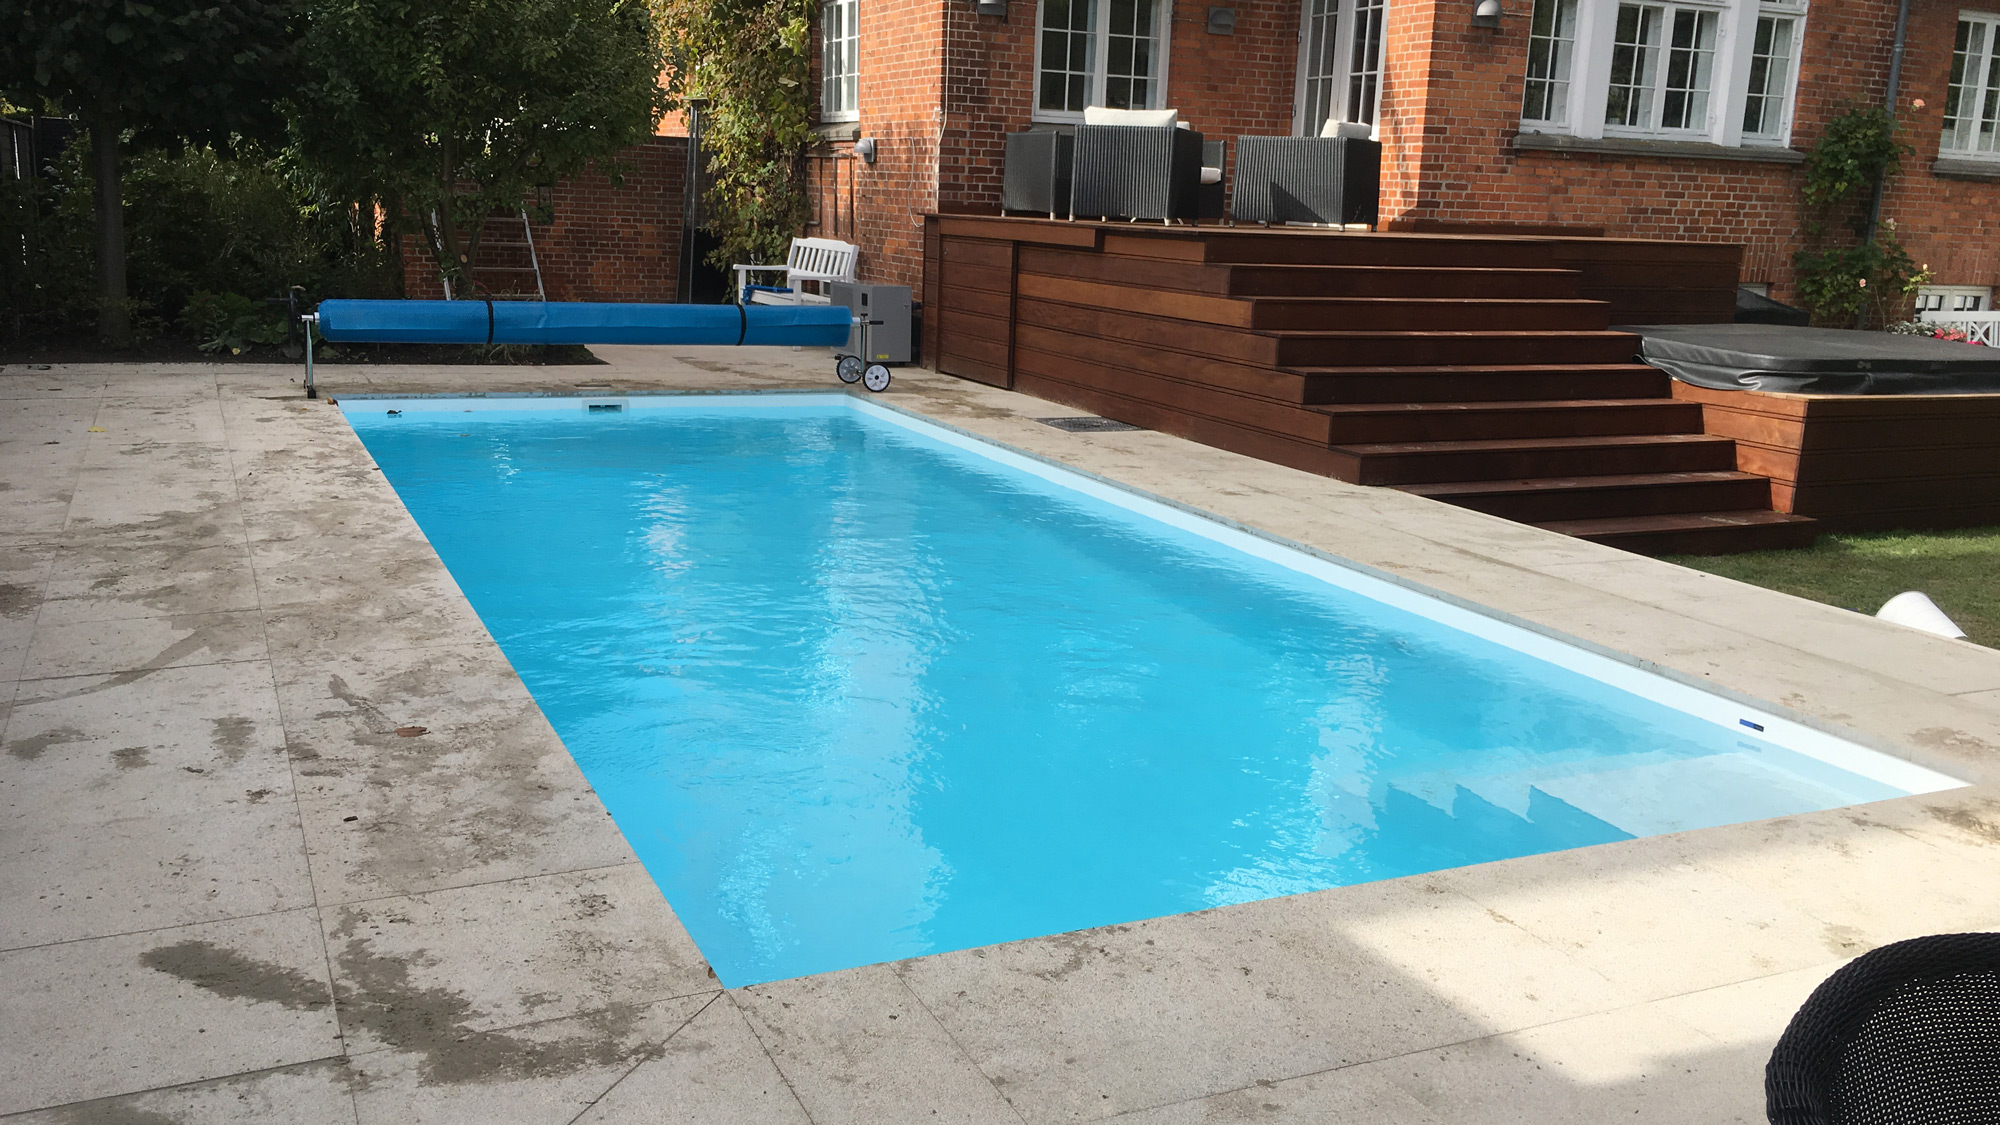 Pool med termocover